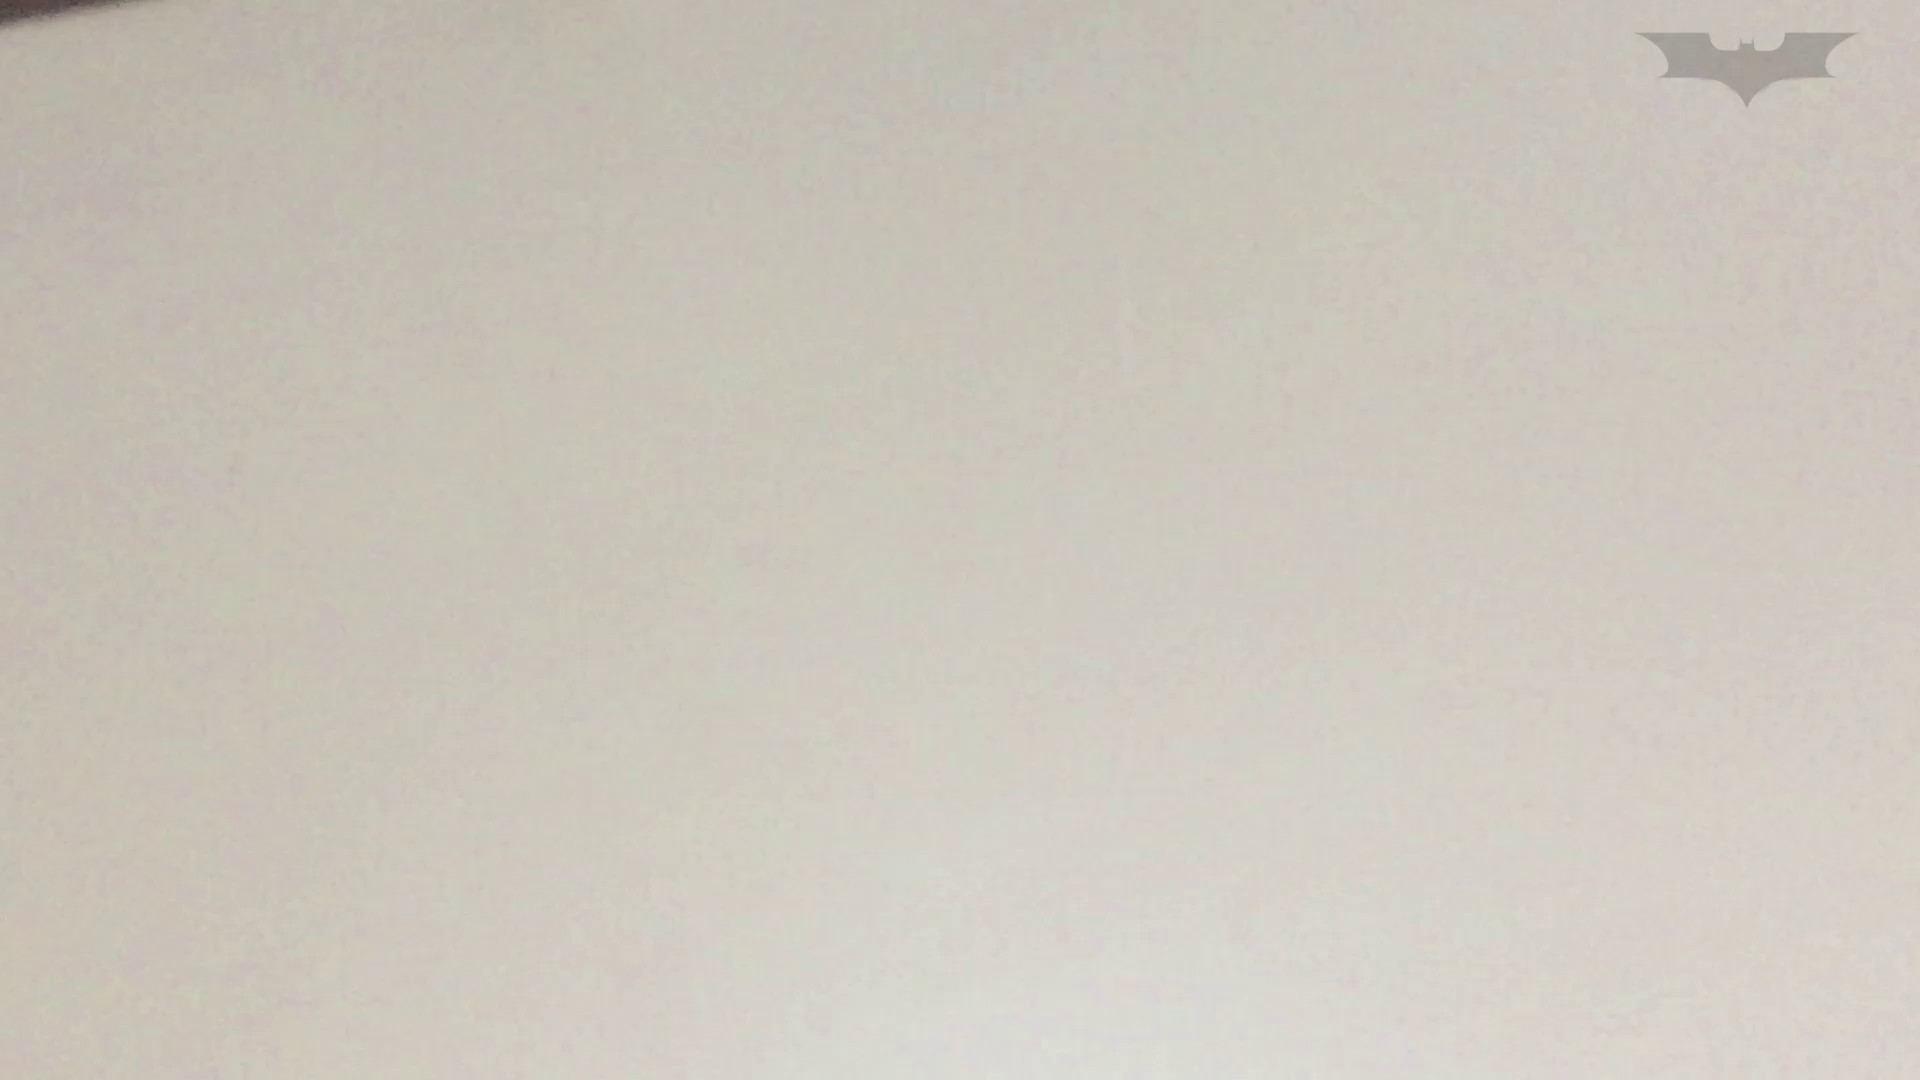 JD盗撮 美女の洗面所の秘密 Vol.74 盗撮エロすぎ   OL  26連発 12